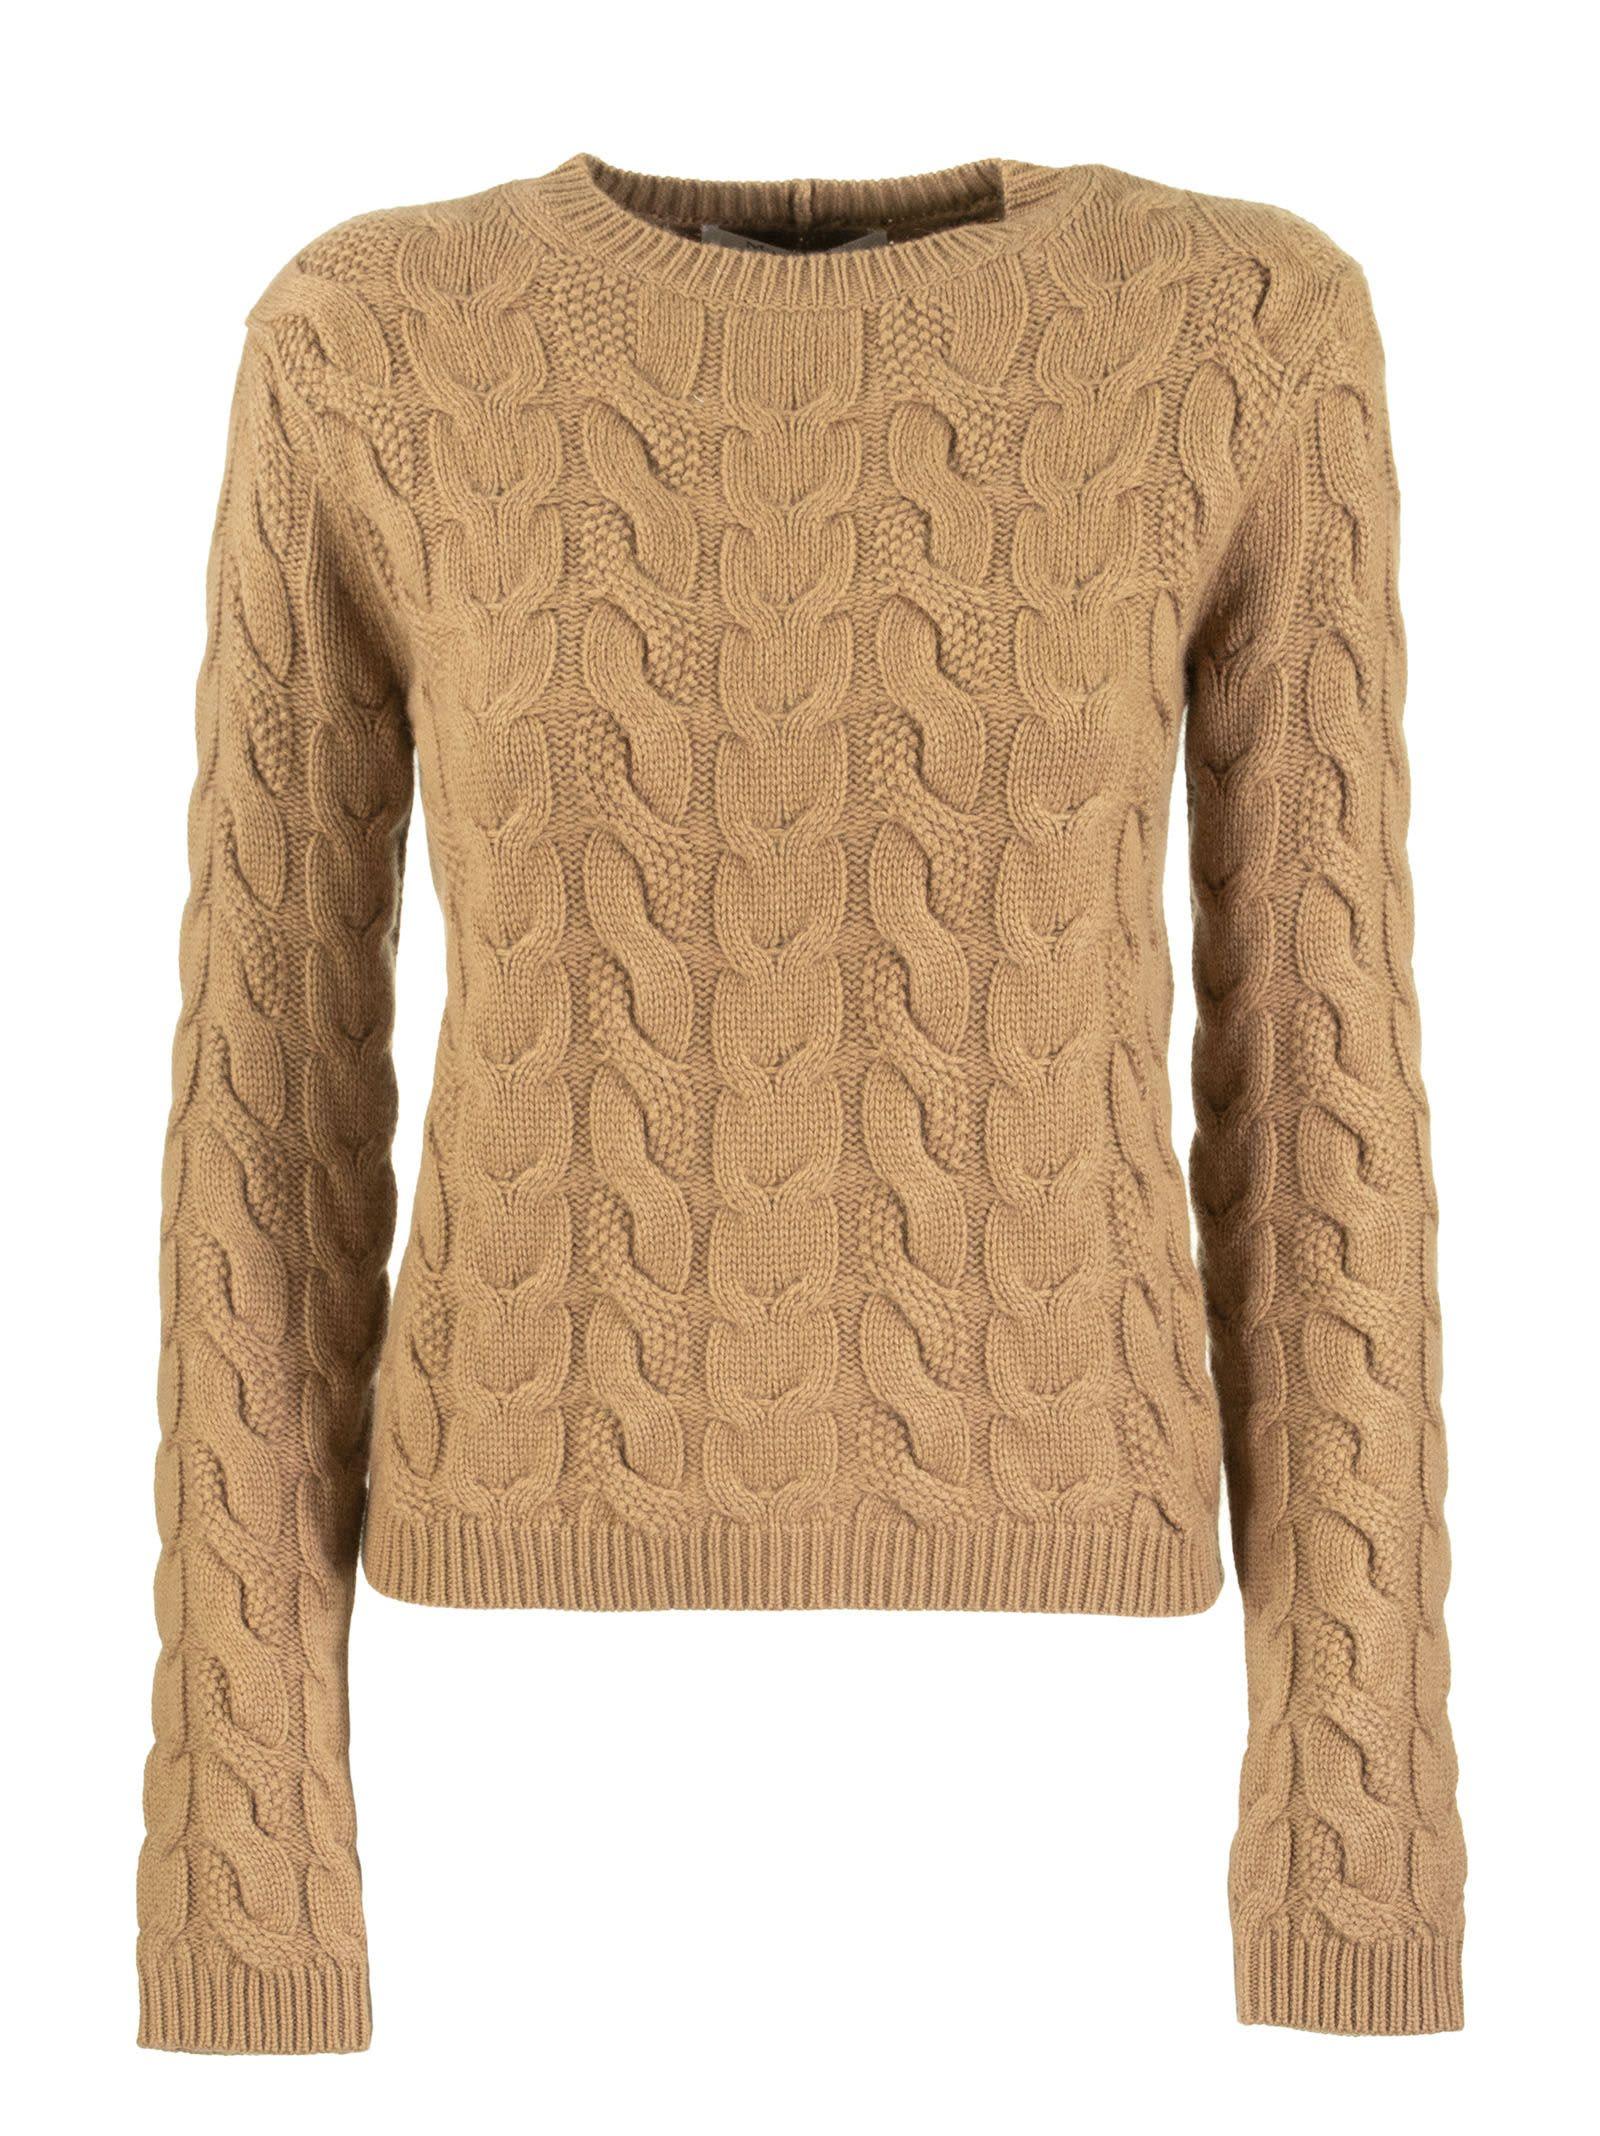 Max Mara Nettuno Wool And Cashmere Yarn Jumper